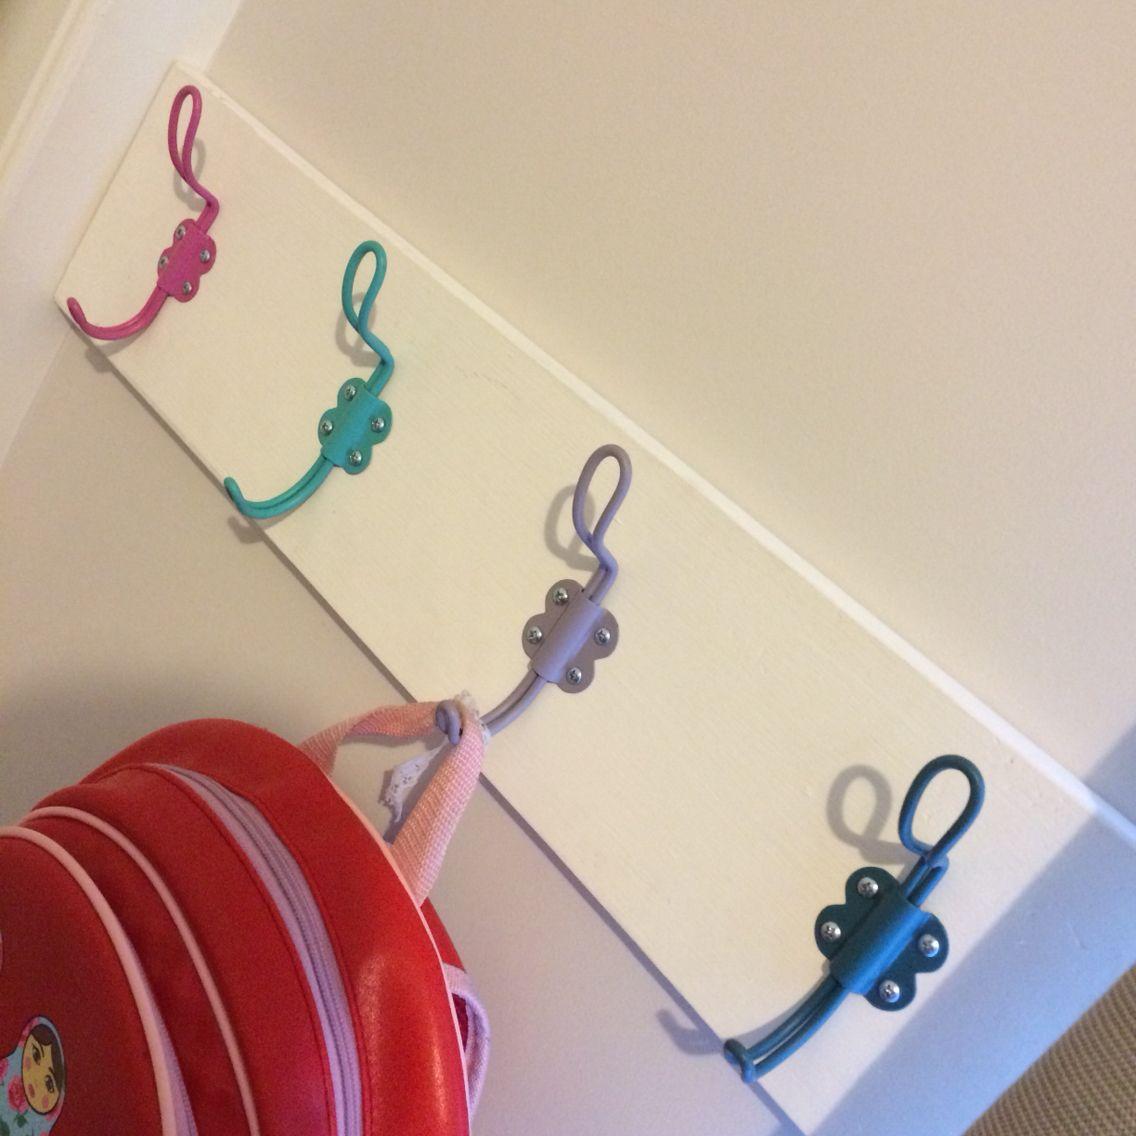 Finally got Grace's hooks up in her room. Room, Graceful